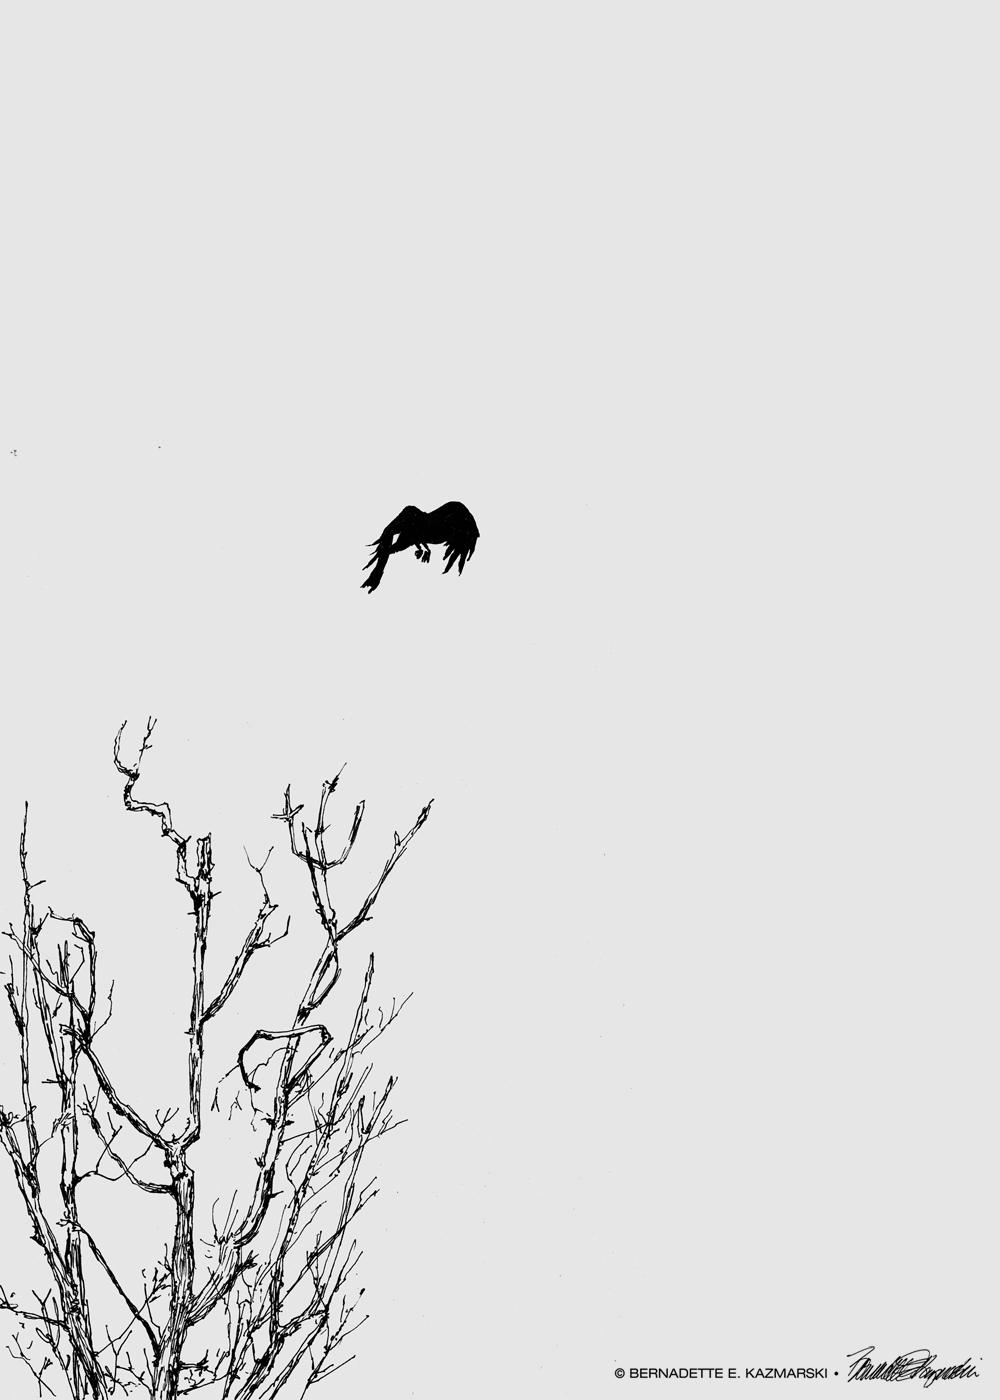 As the Crow Flies, 10 x 14, ink on gray paper © Bernadette E. Kazmarski